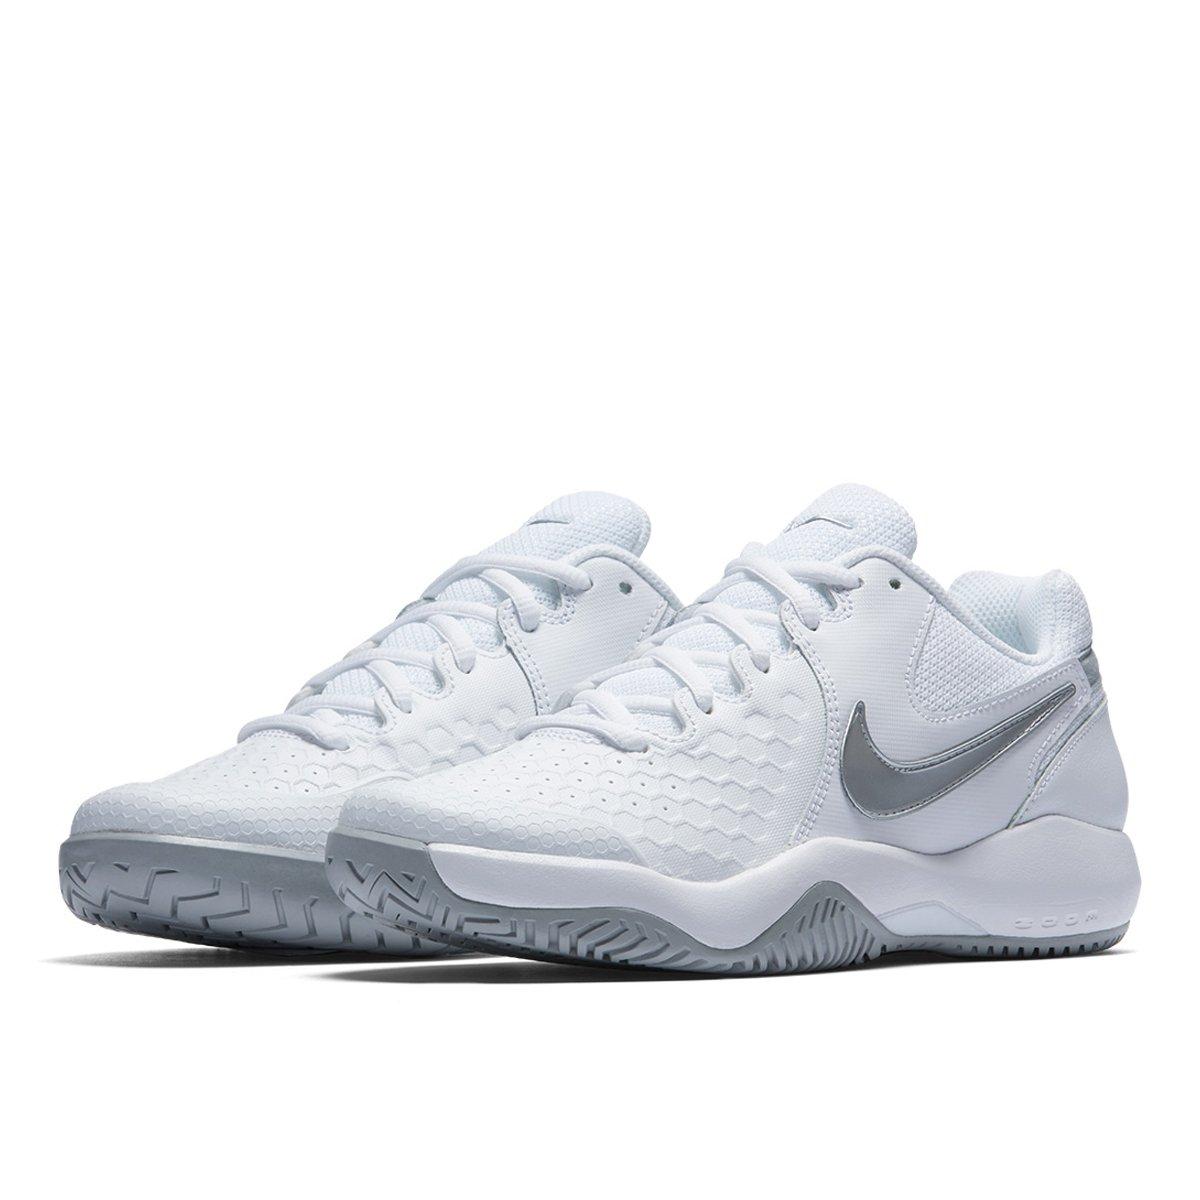 44cb43c11d085 Tênis Nike Air Zoom Resistance Feminino - Branco - Compre Agora ...